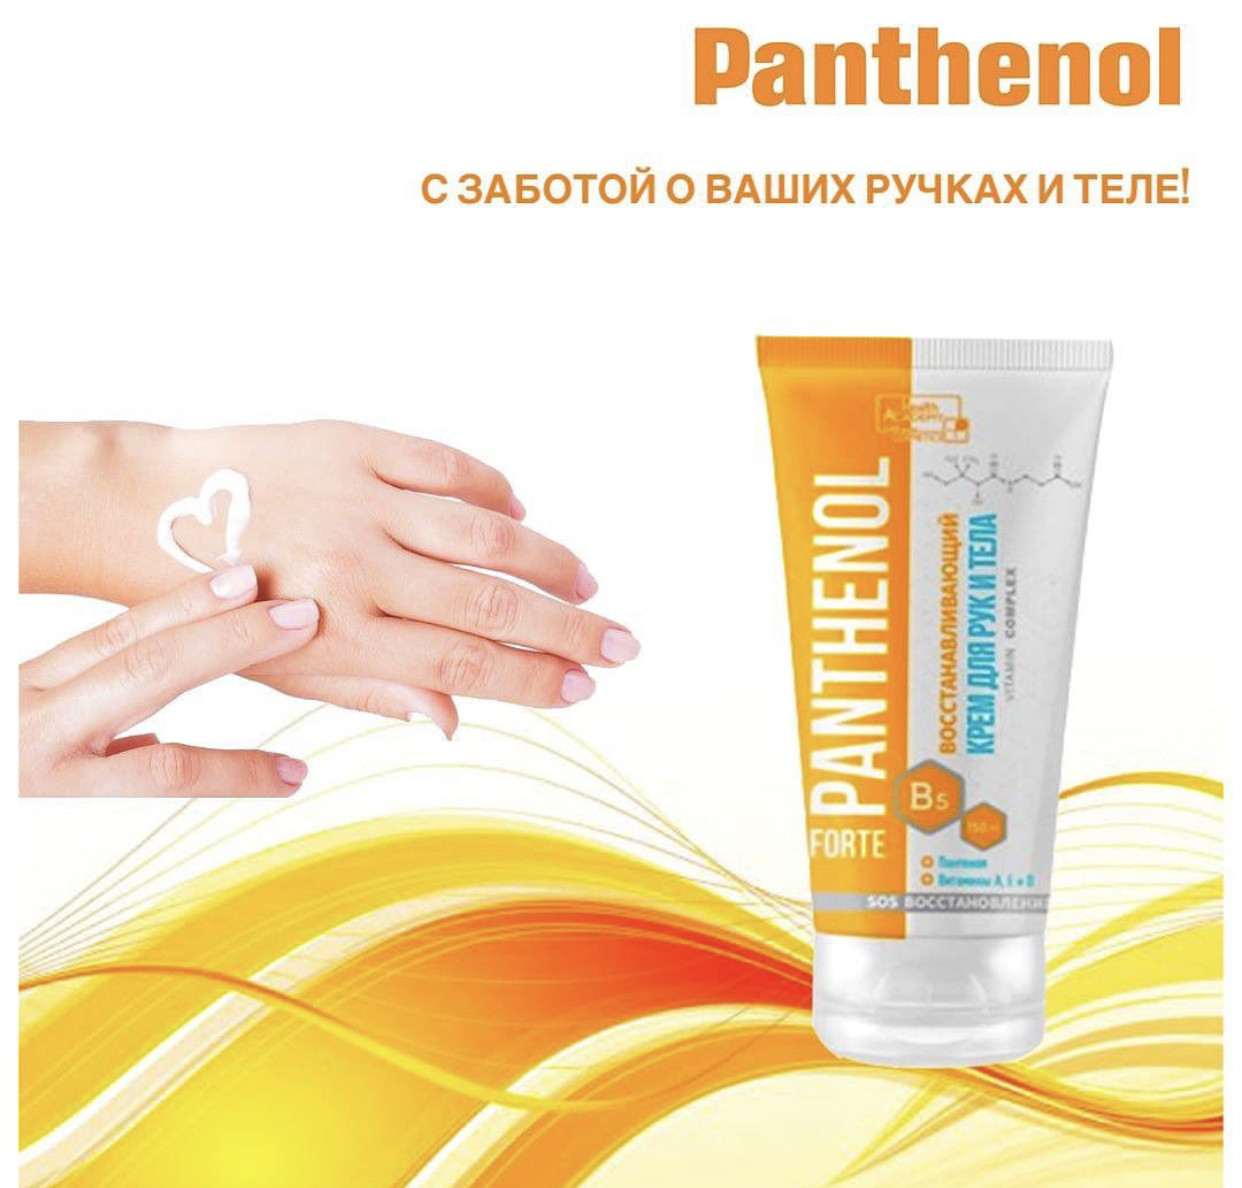 Panthenol восстанавливающий крем для рук и тела